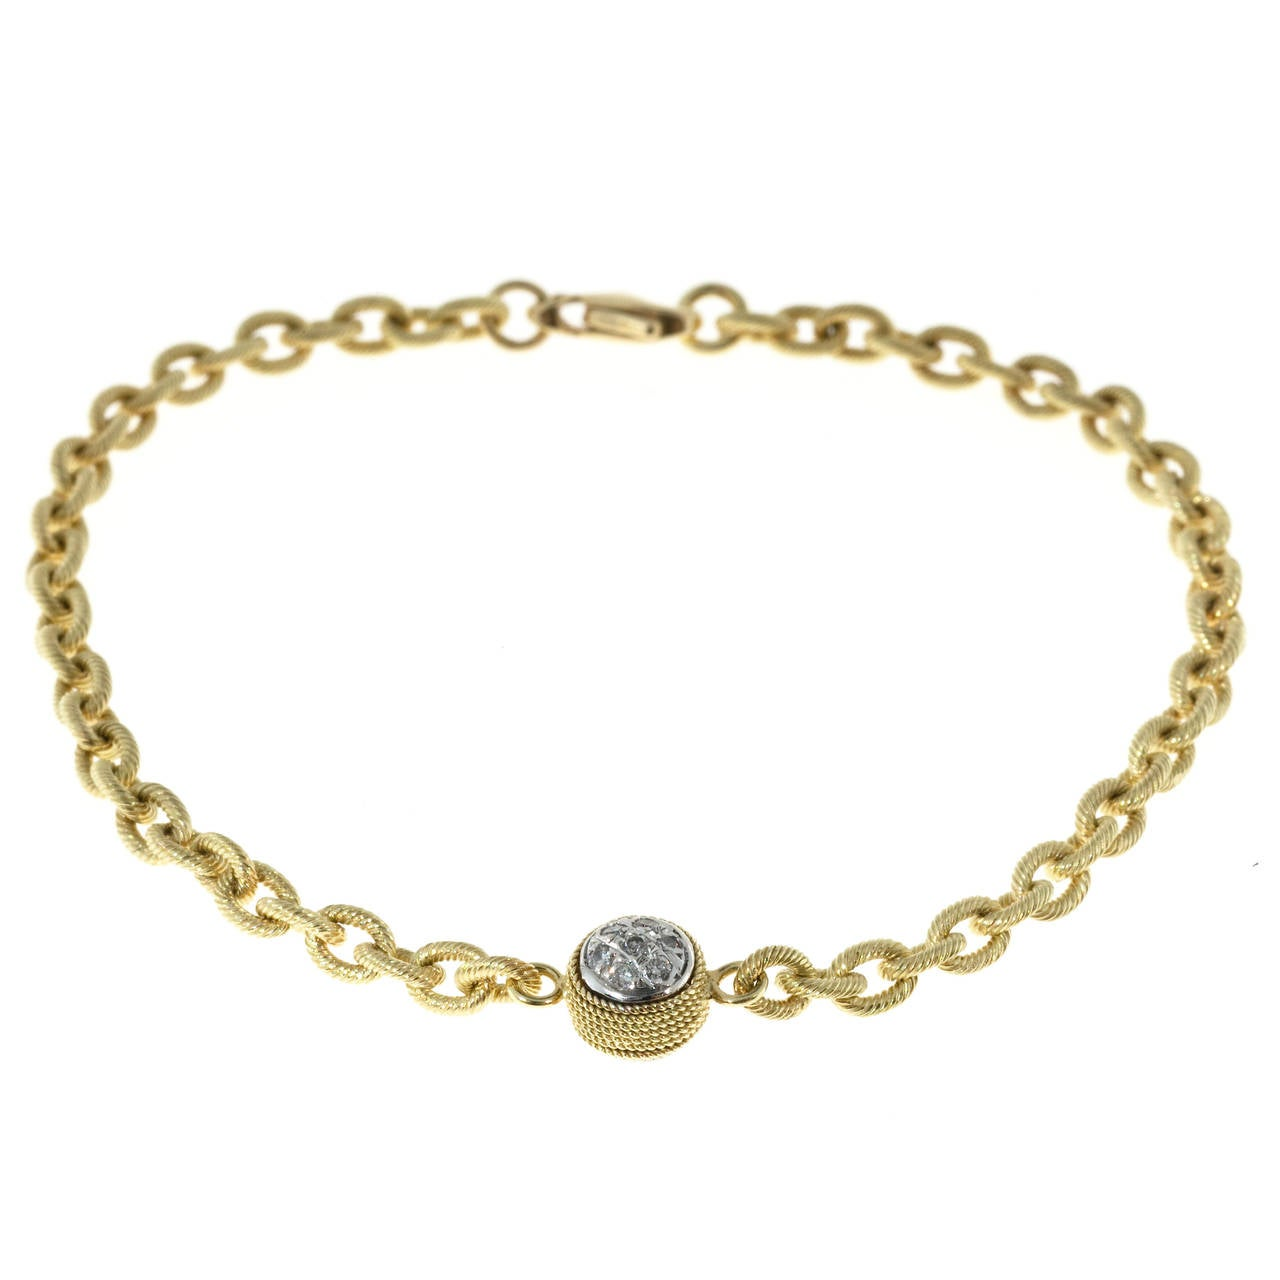 Diamond Textured Gold Link Bracelet